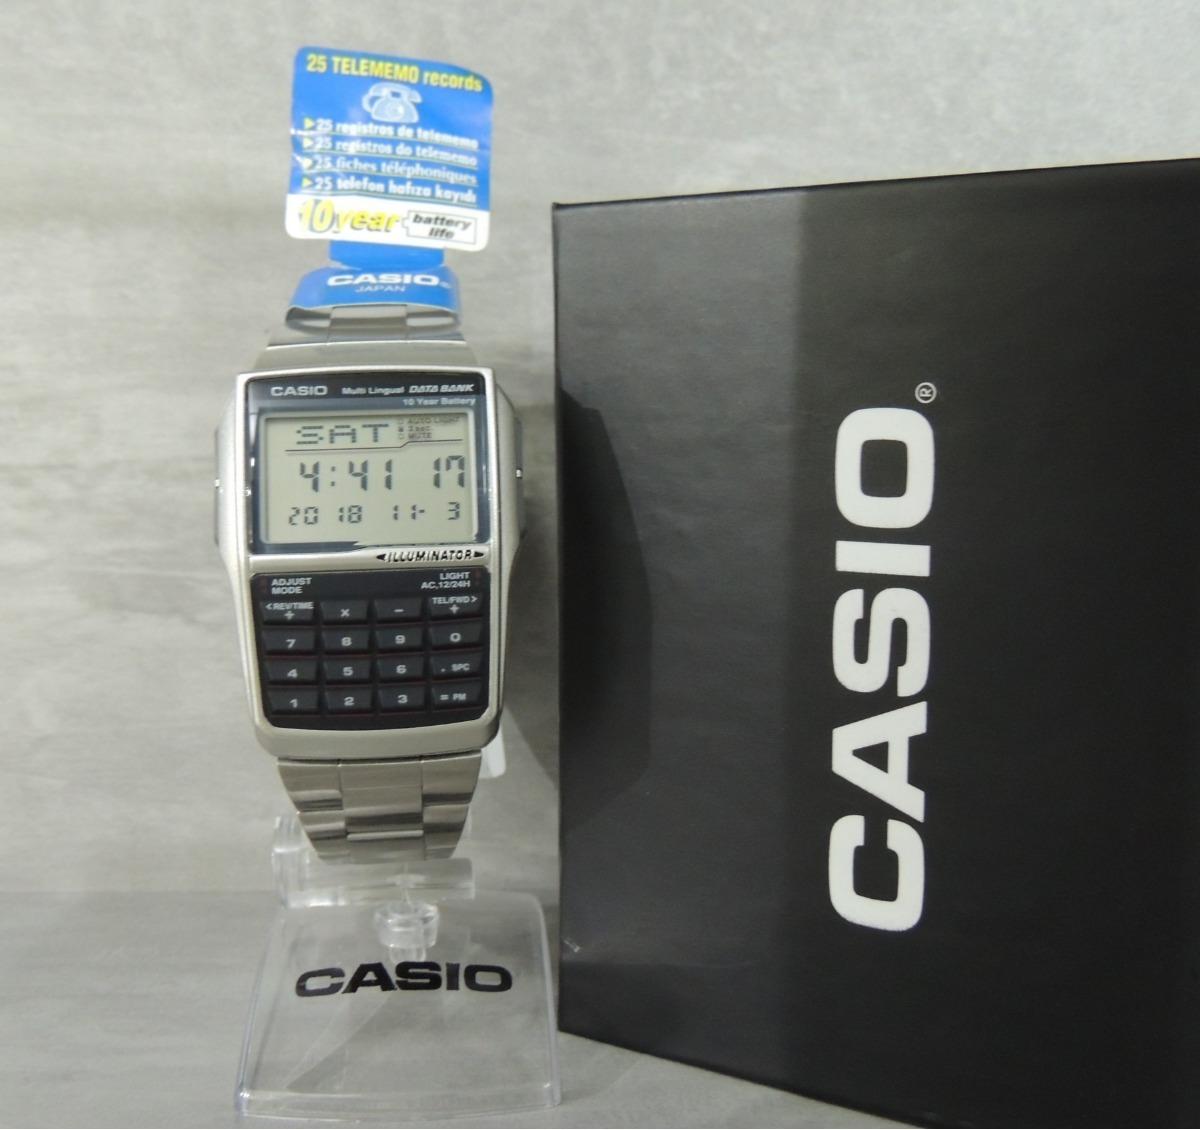 fbe80fcd1ed Relógio Casio Data Bank - Modelo Dbc-32d-1adf (nf garantia) - R  259 ...